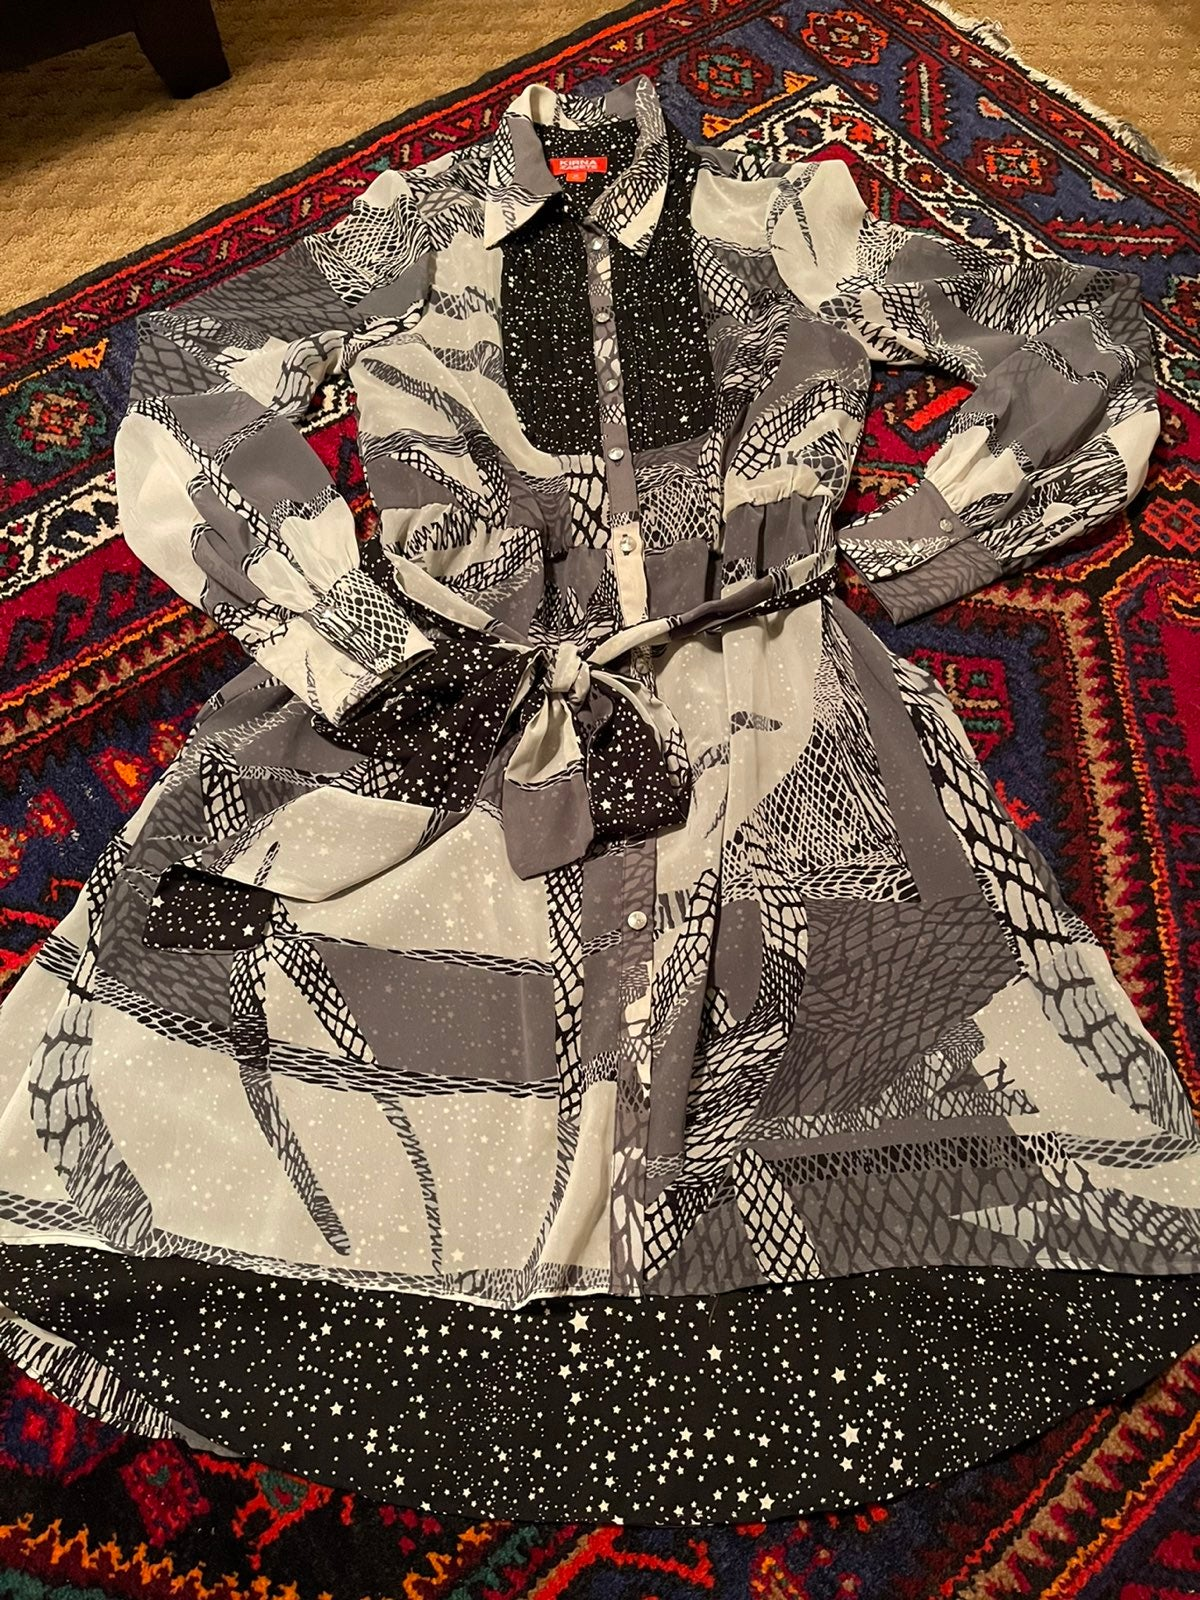 Kirna zabete long sleeve dress